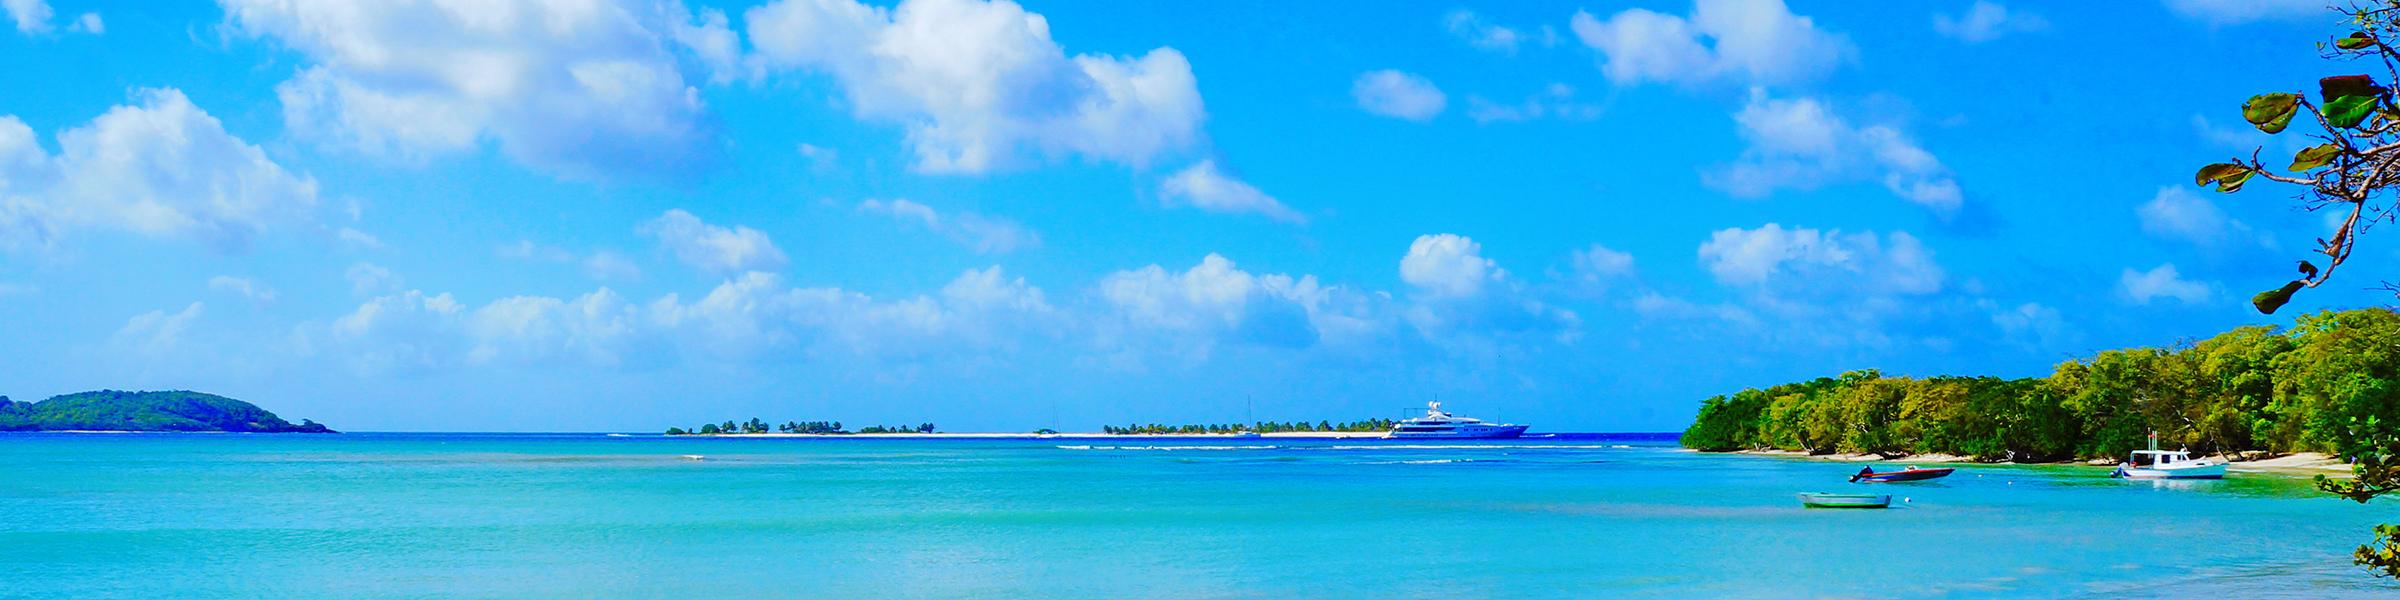 Grenada Carriacou Island